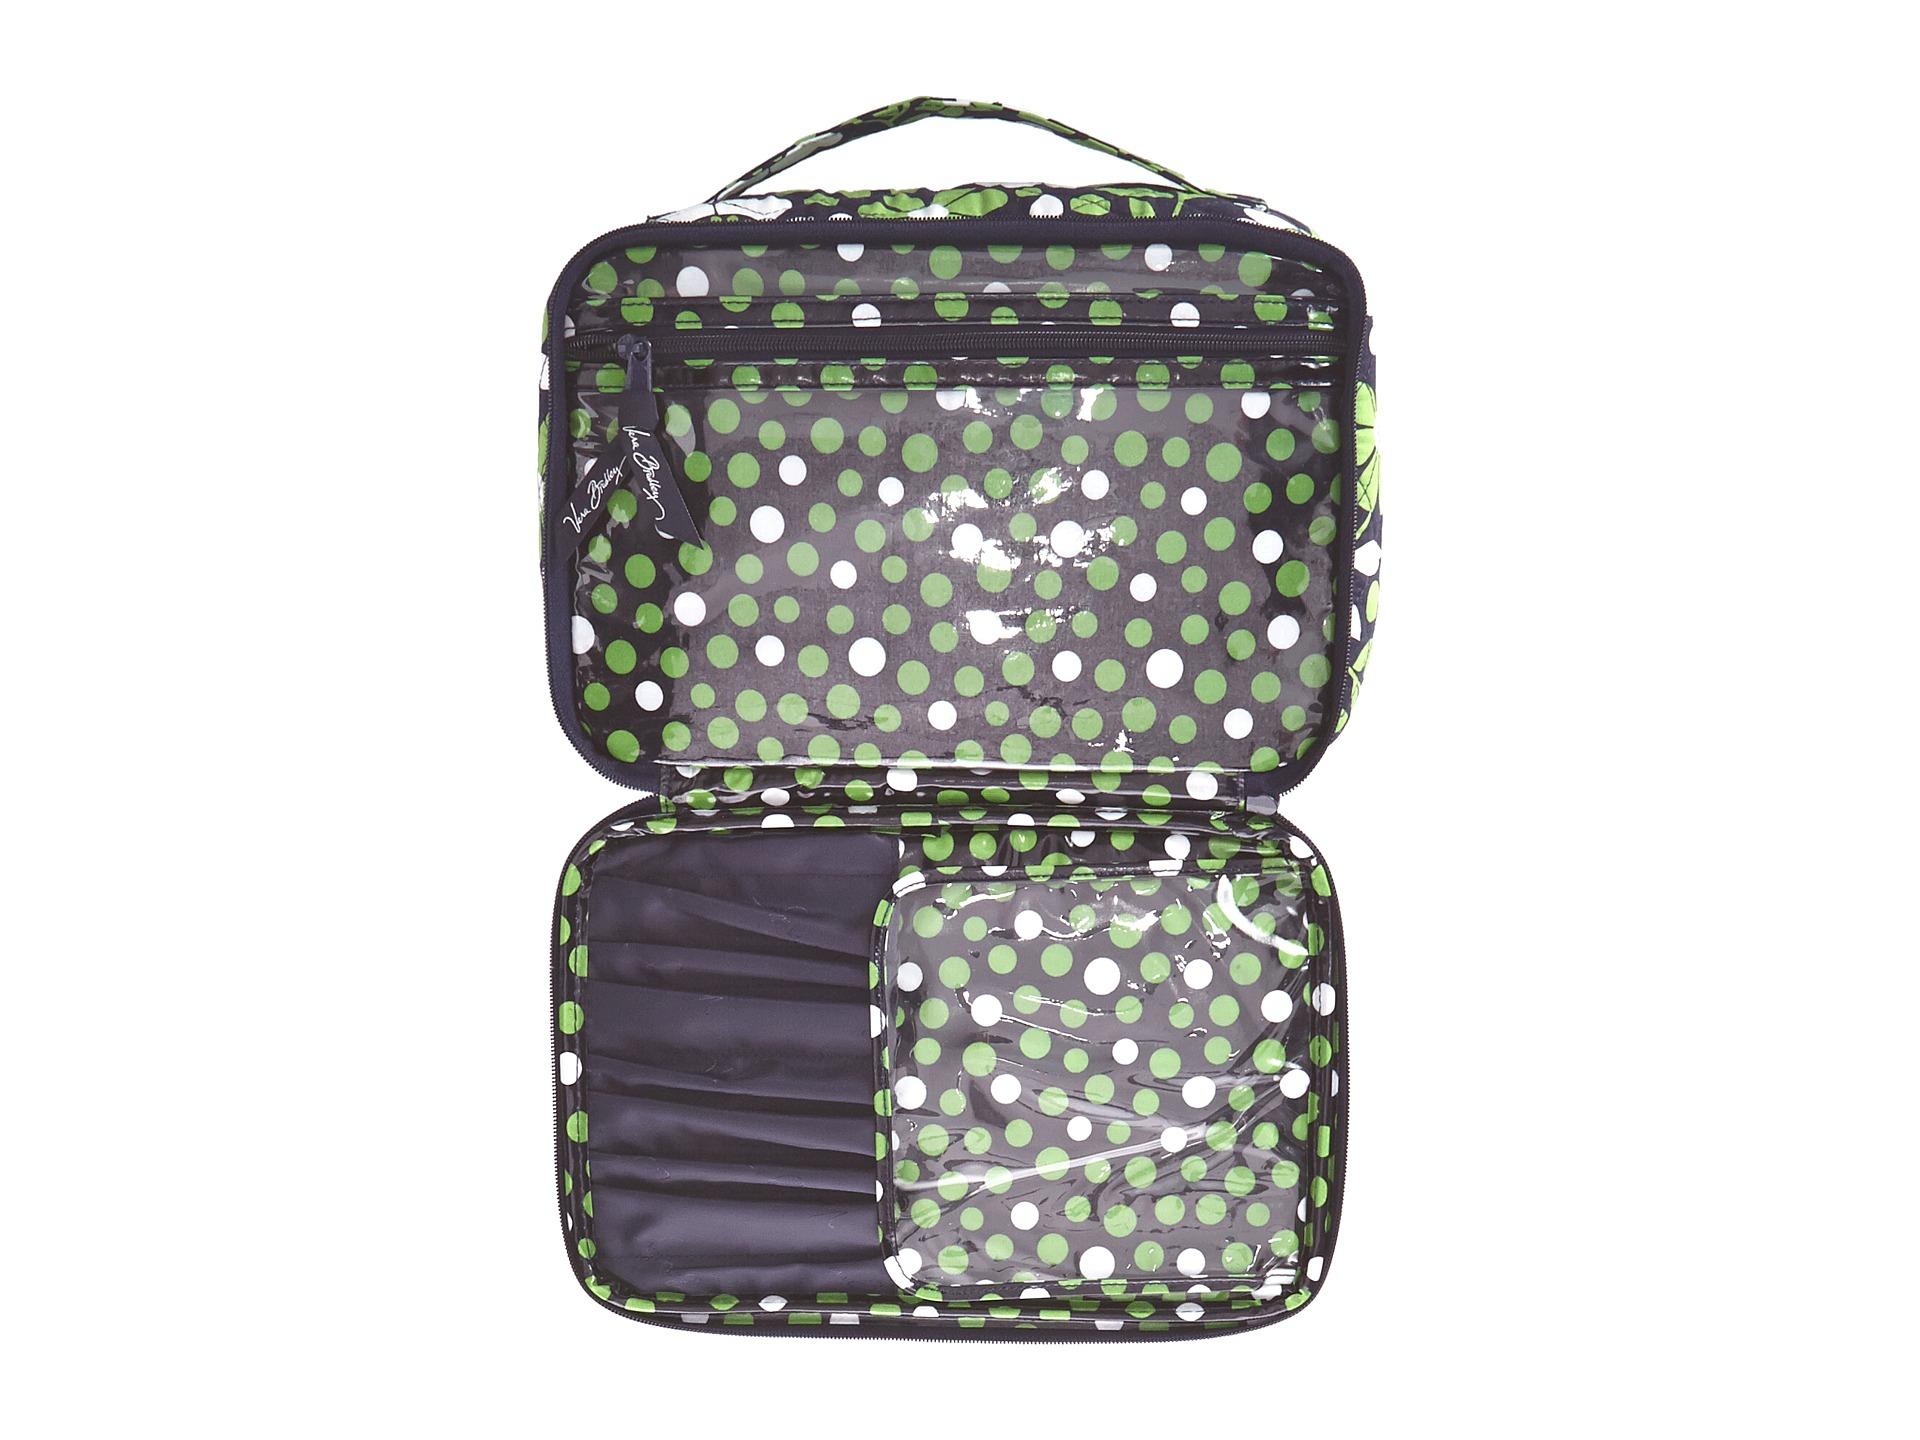 9983e37ef6 Lyst - Vera Bradley Large Blush   Brush Makeup Case in Green